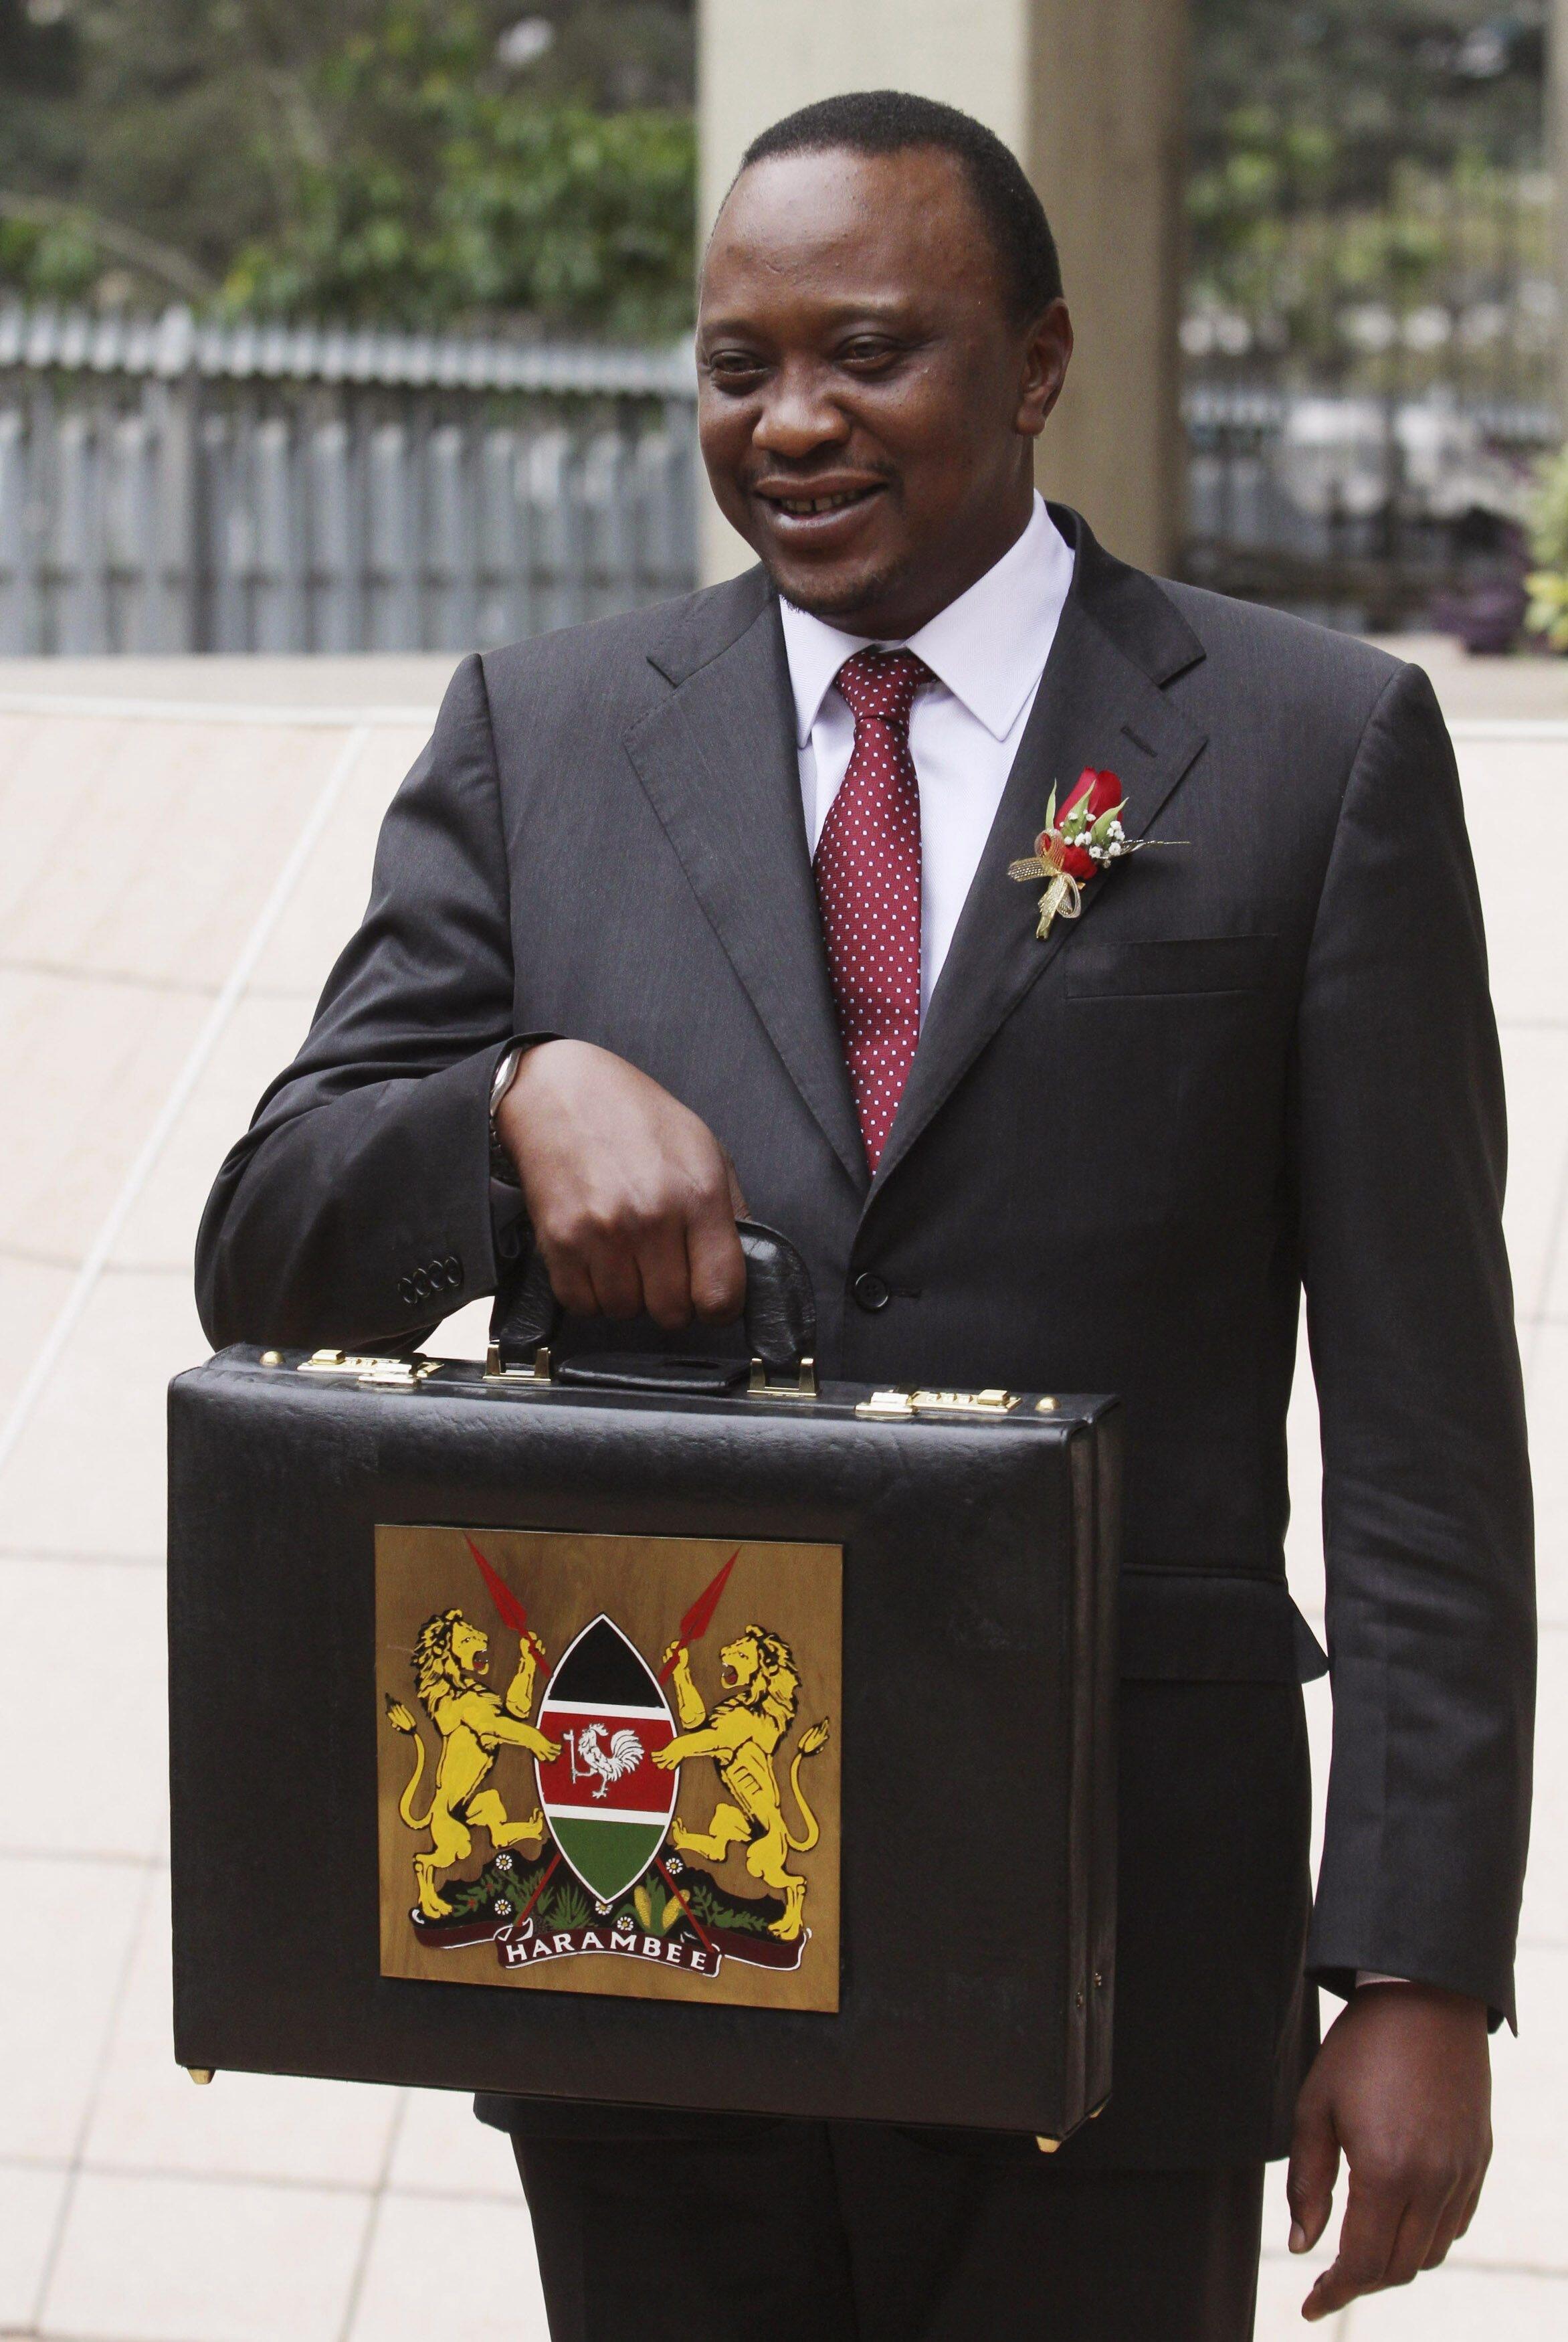 Uhuru Kenyatta Ministan kudi na kasar Kenya